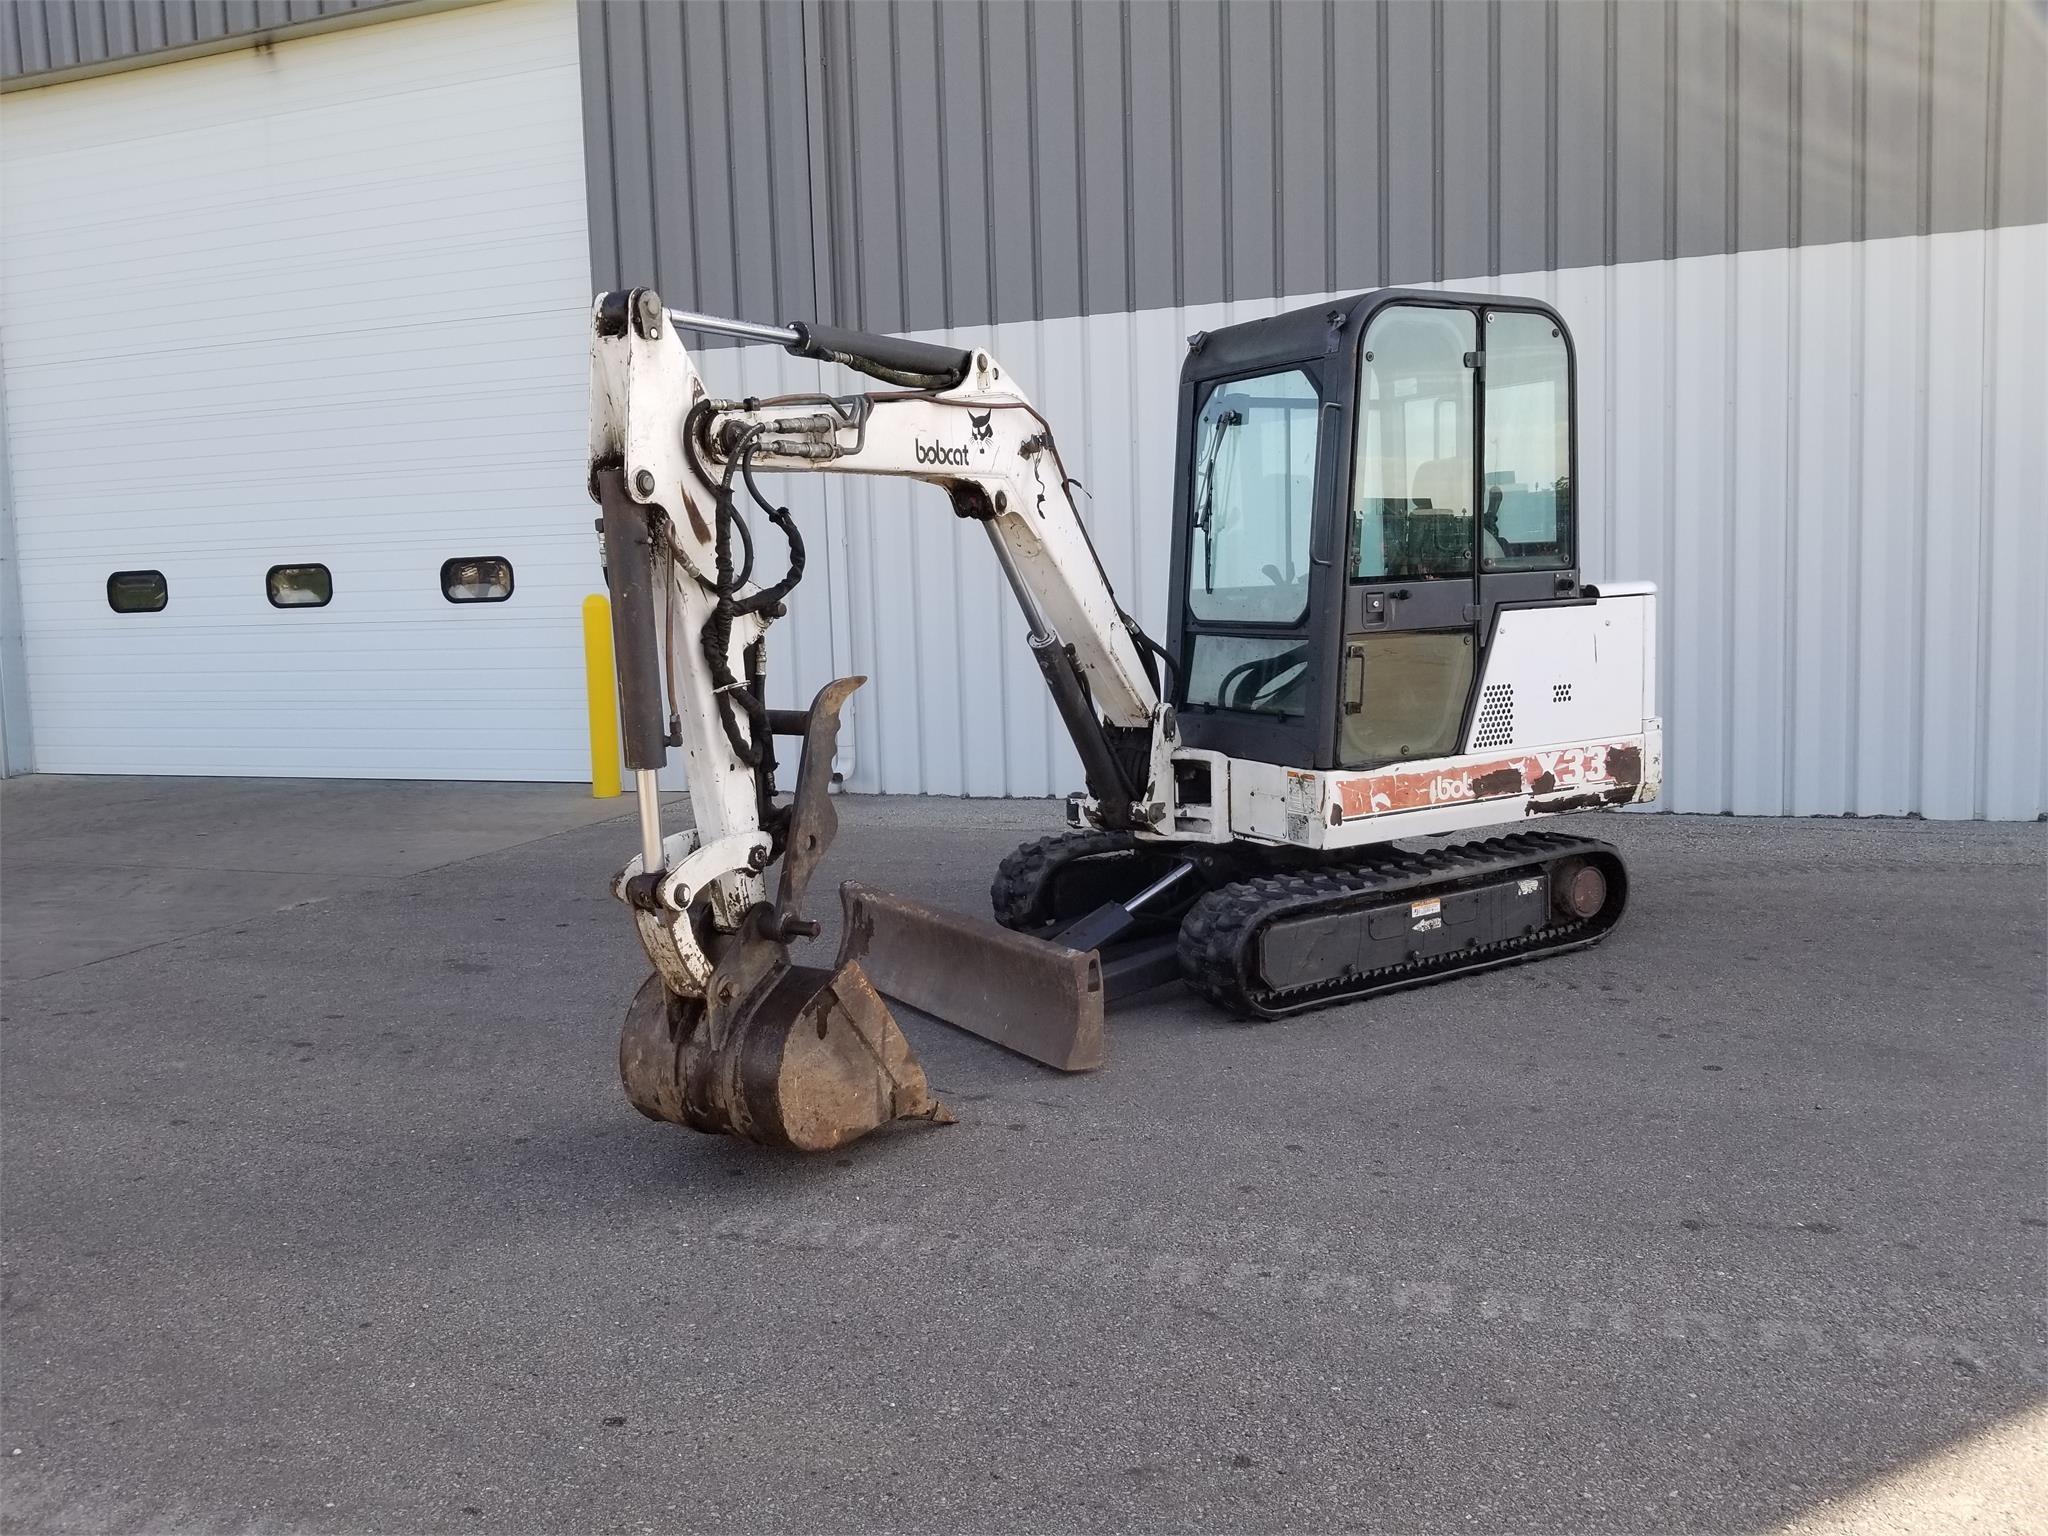 1997 Bobcat 331X Excavators and Mini Excavator